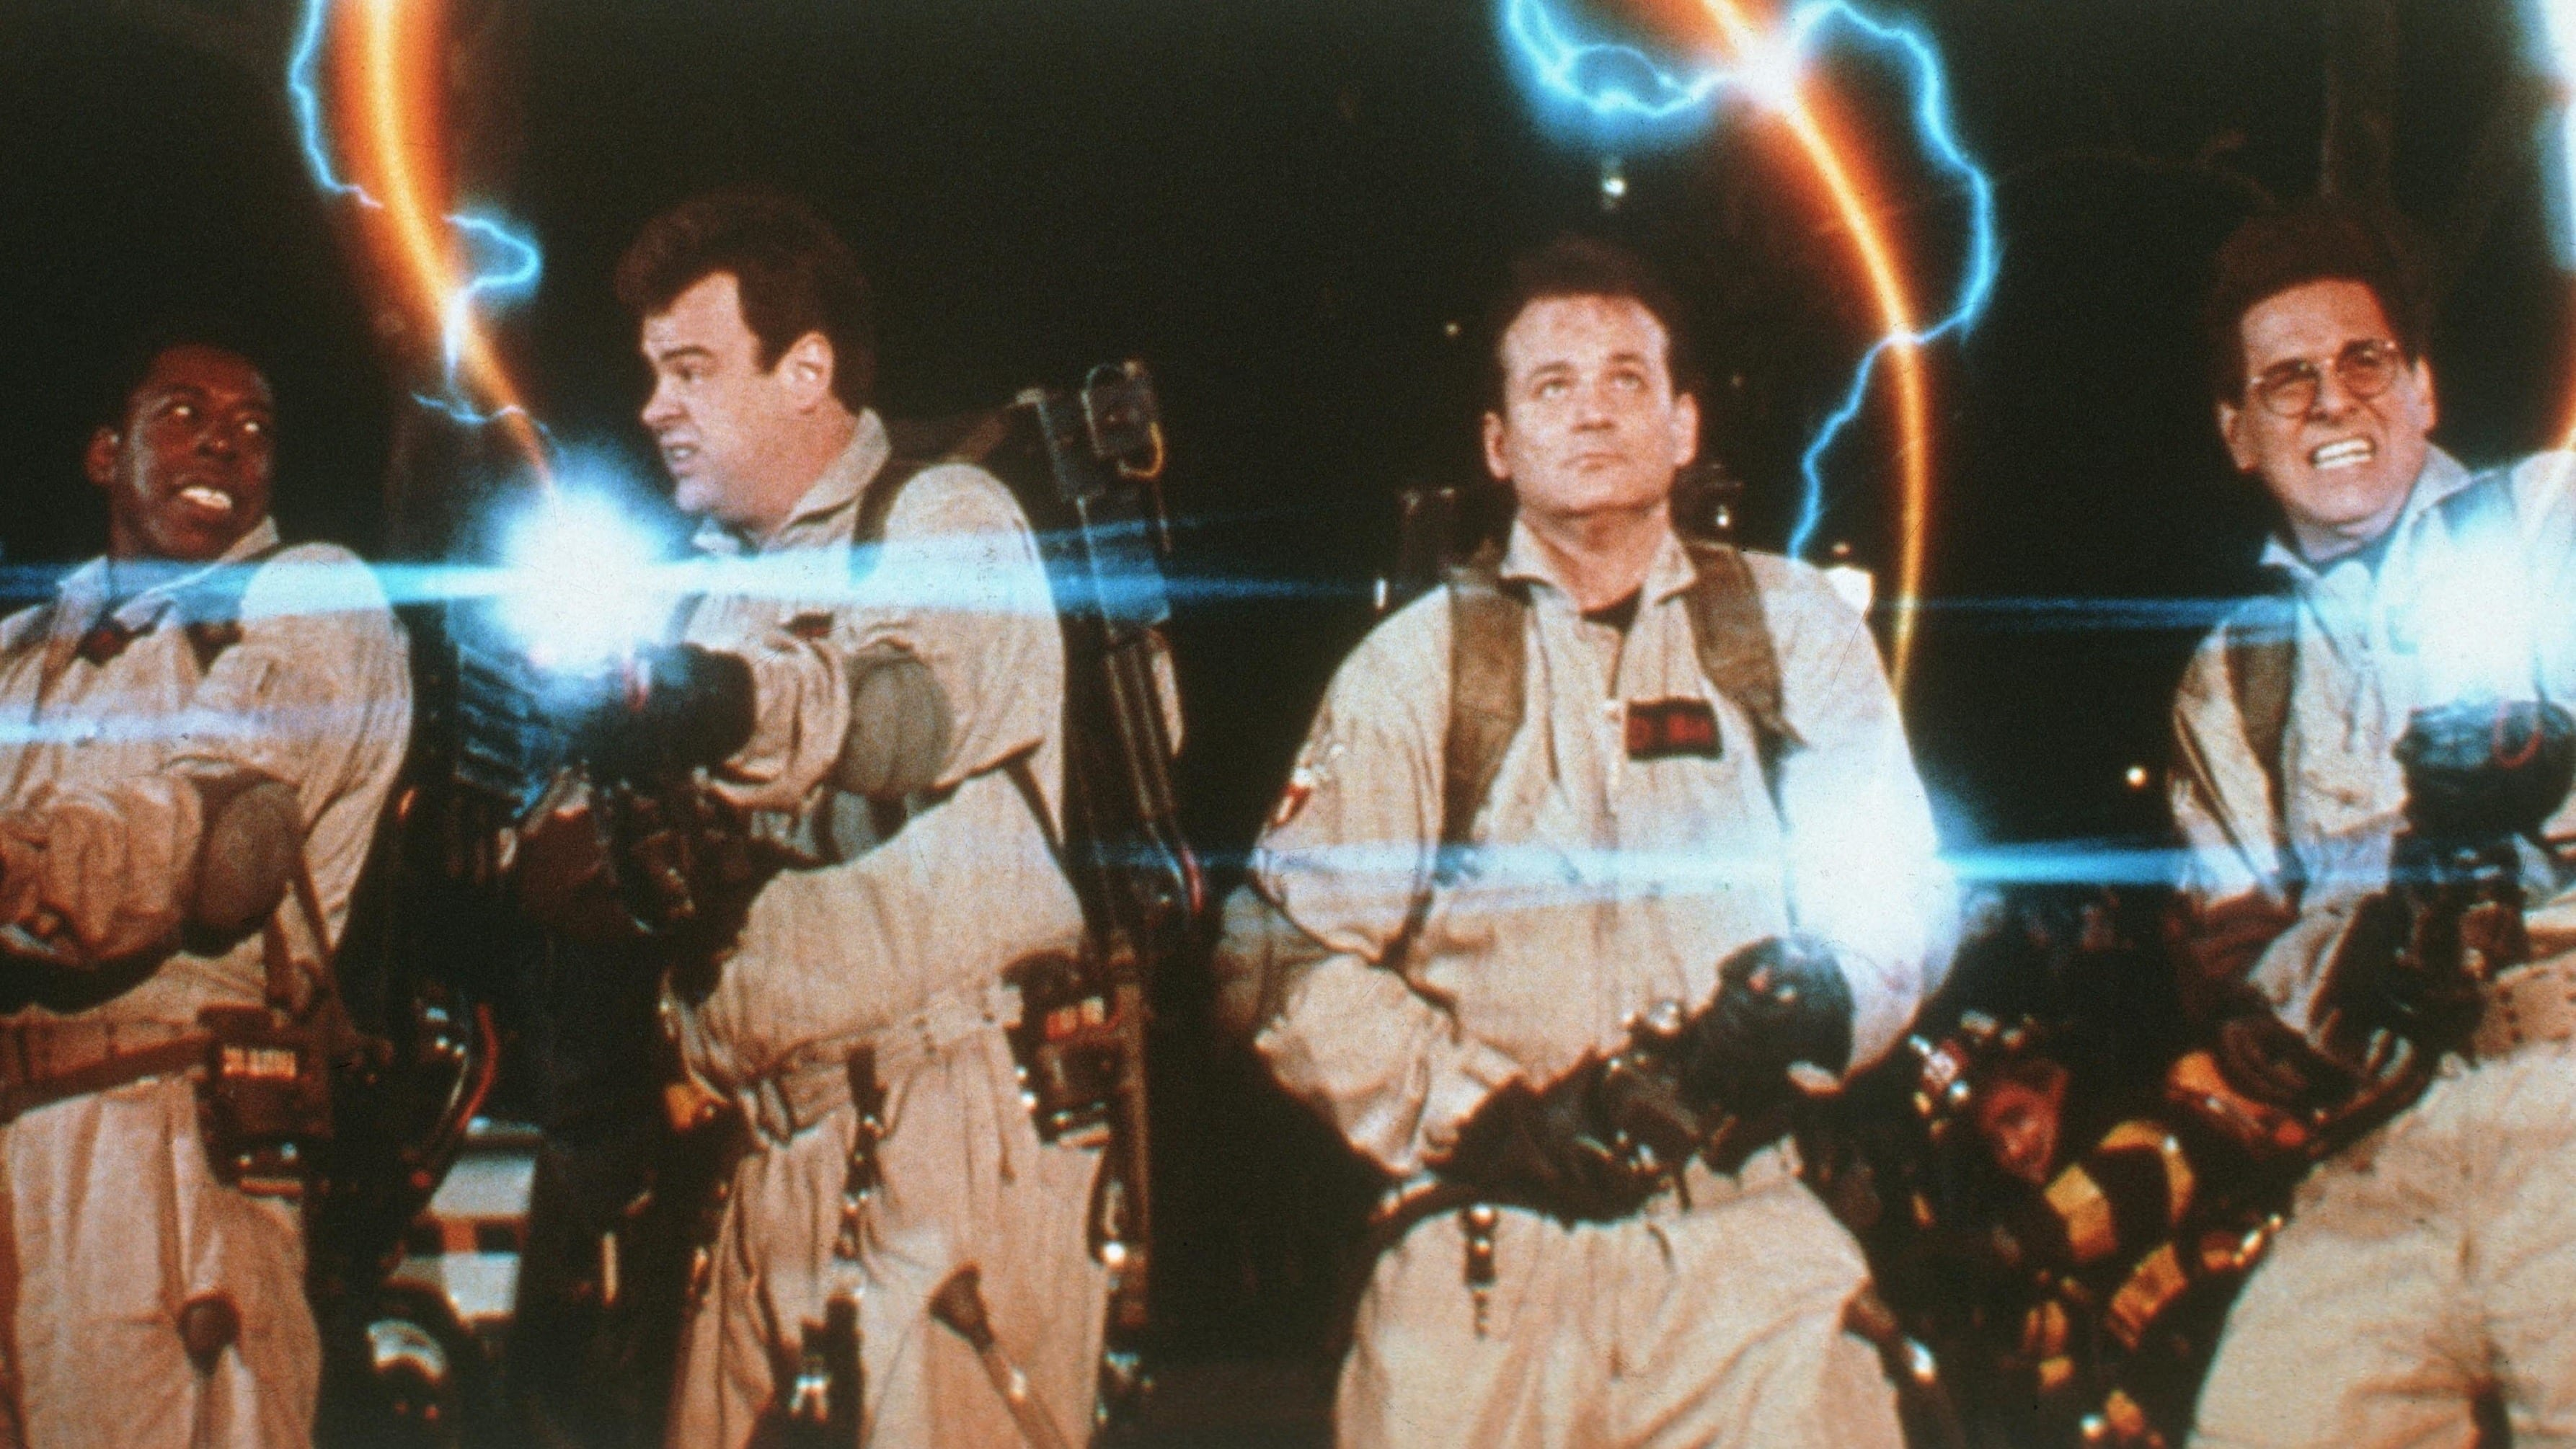 Bustin' Makes Them Feel Good: Ernie Hudson, Dan Aykroyd, Bill Murray, and Harold Ramis in 1984's Ghostbusters.